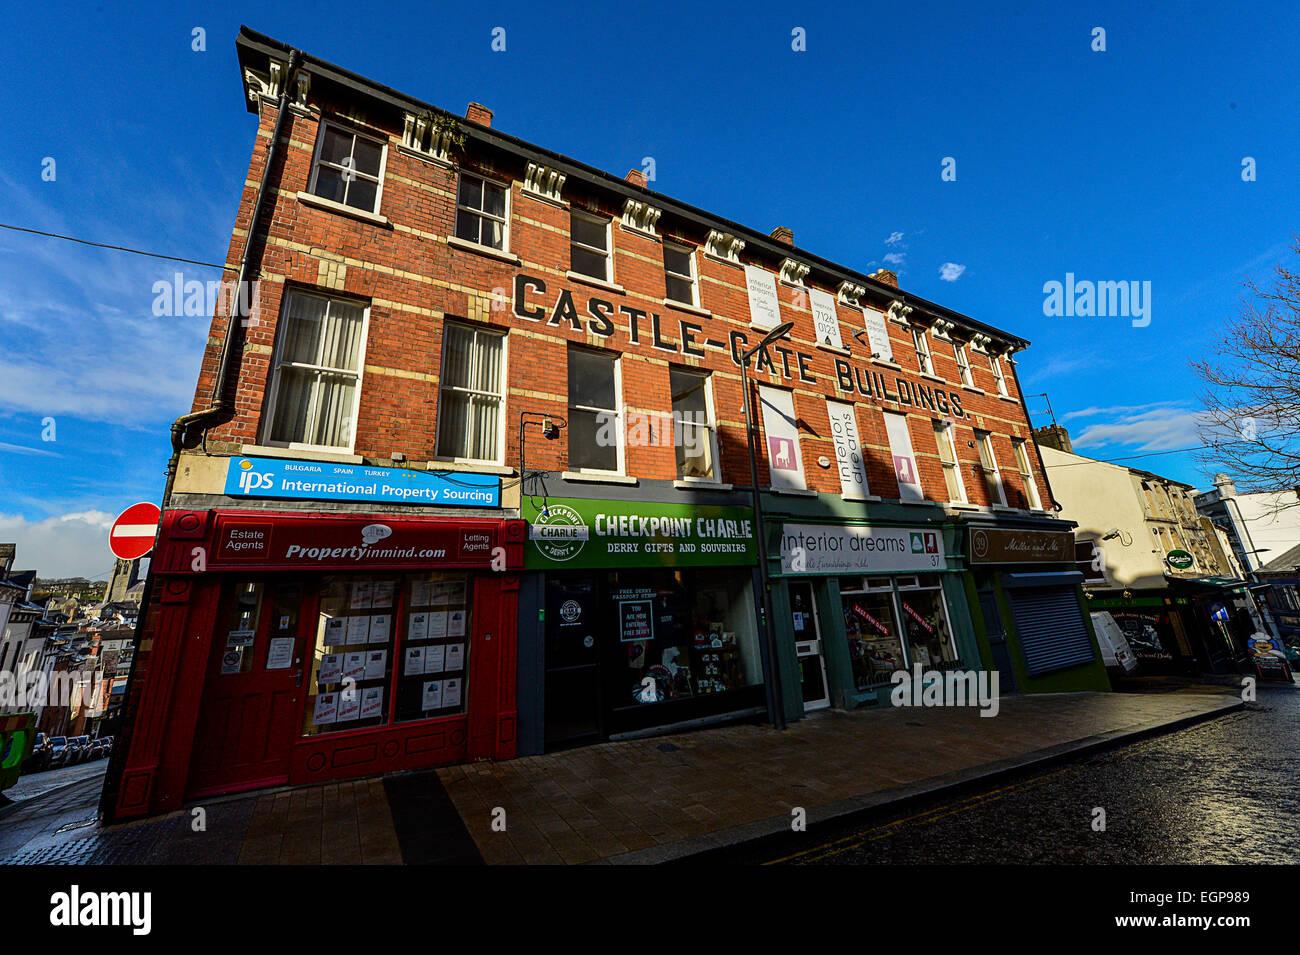 Shop fronts on Waterloo Street, Londonderry, Northern Ireland. Photo: George Sweeney / Alamy - Stock Image